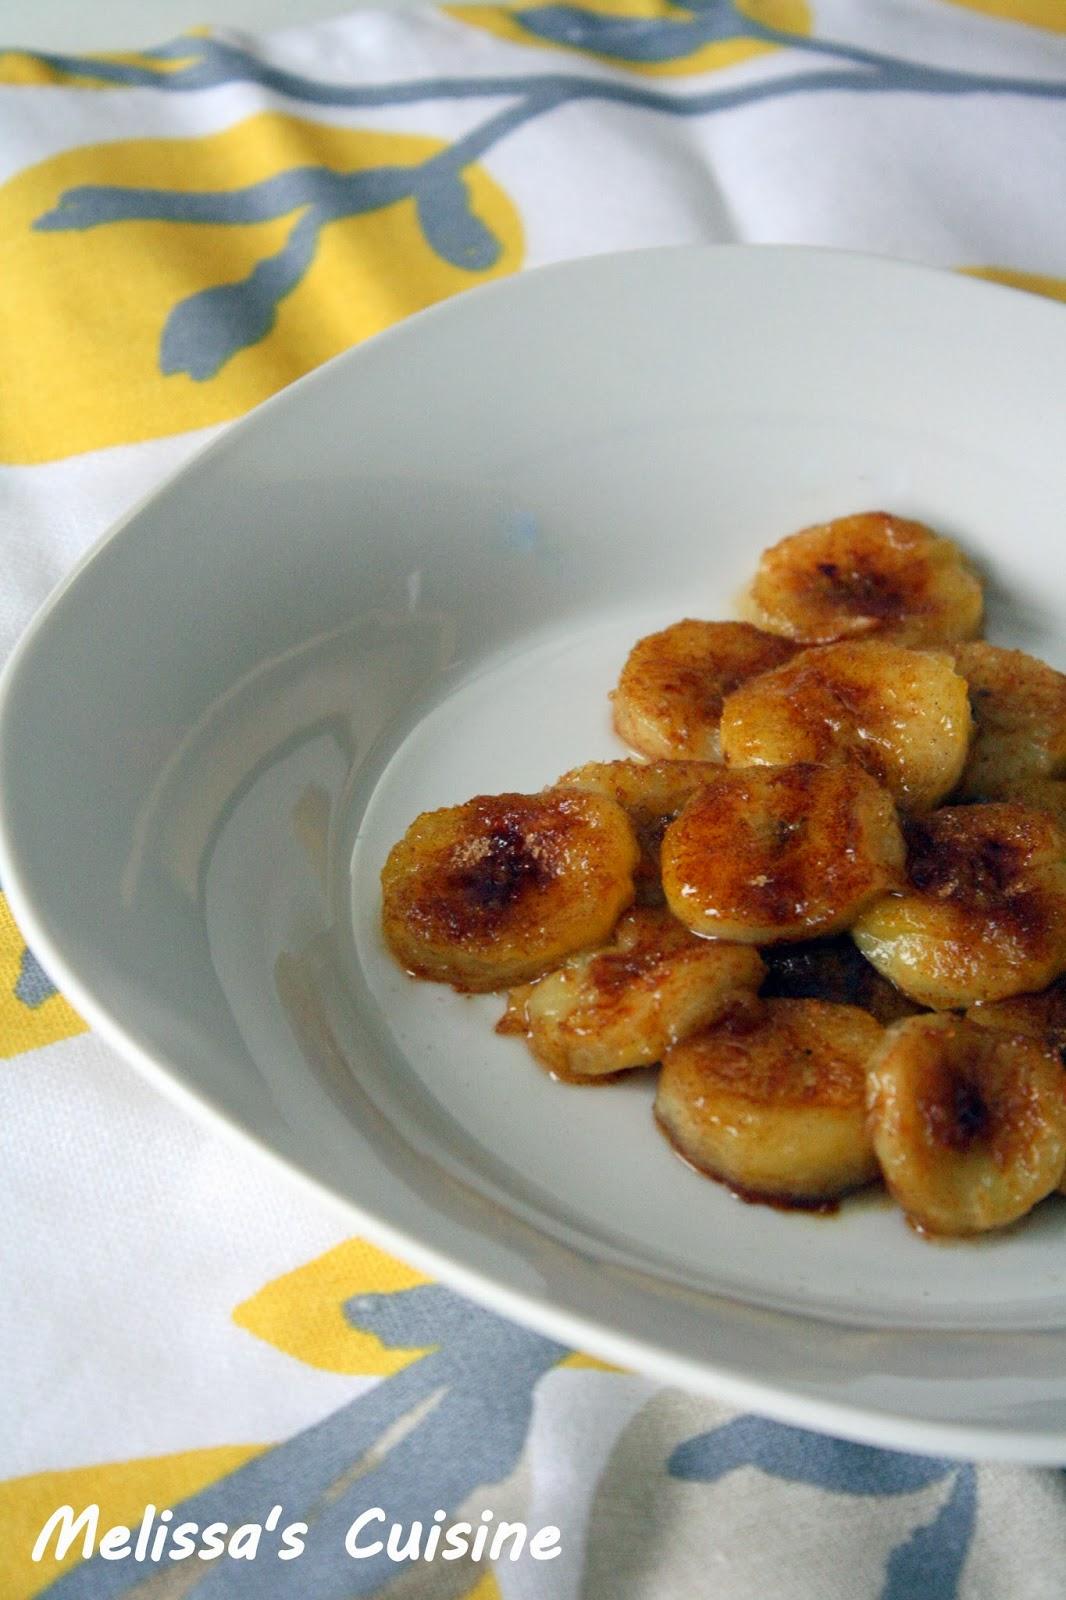 Melissa's Cuisine:  Pan Fried Cinnamon Sugar Bananas